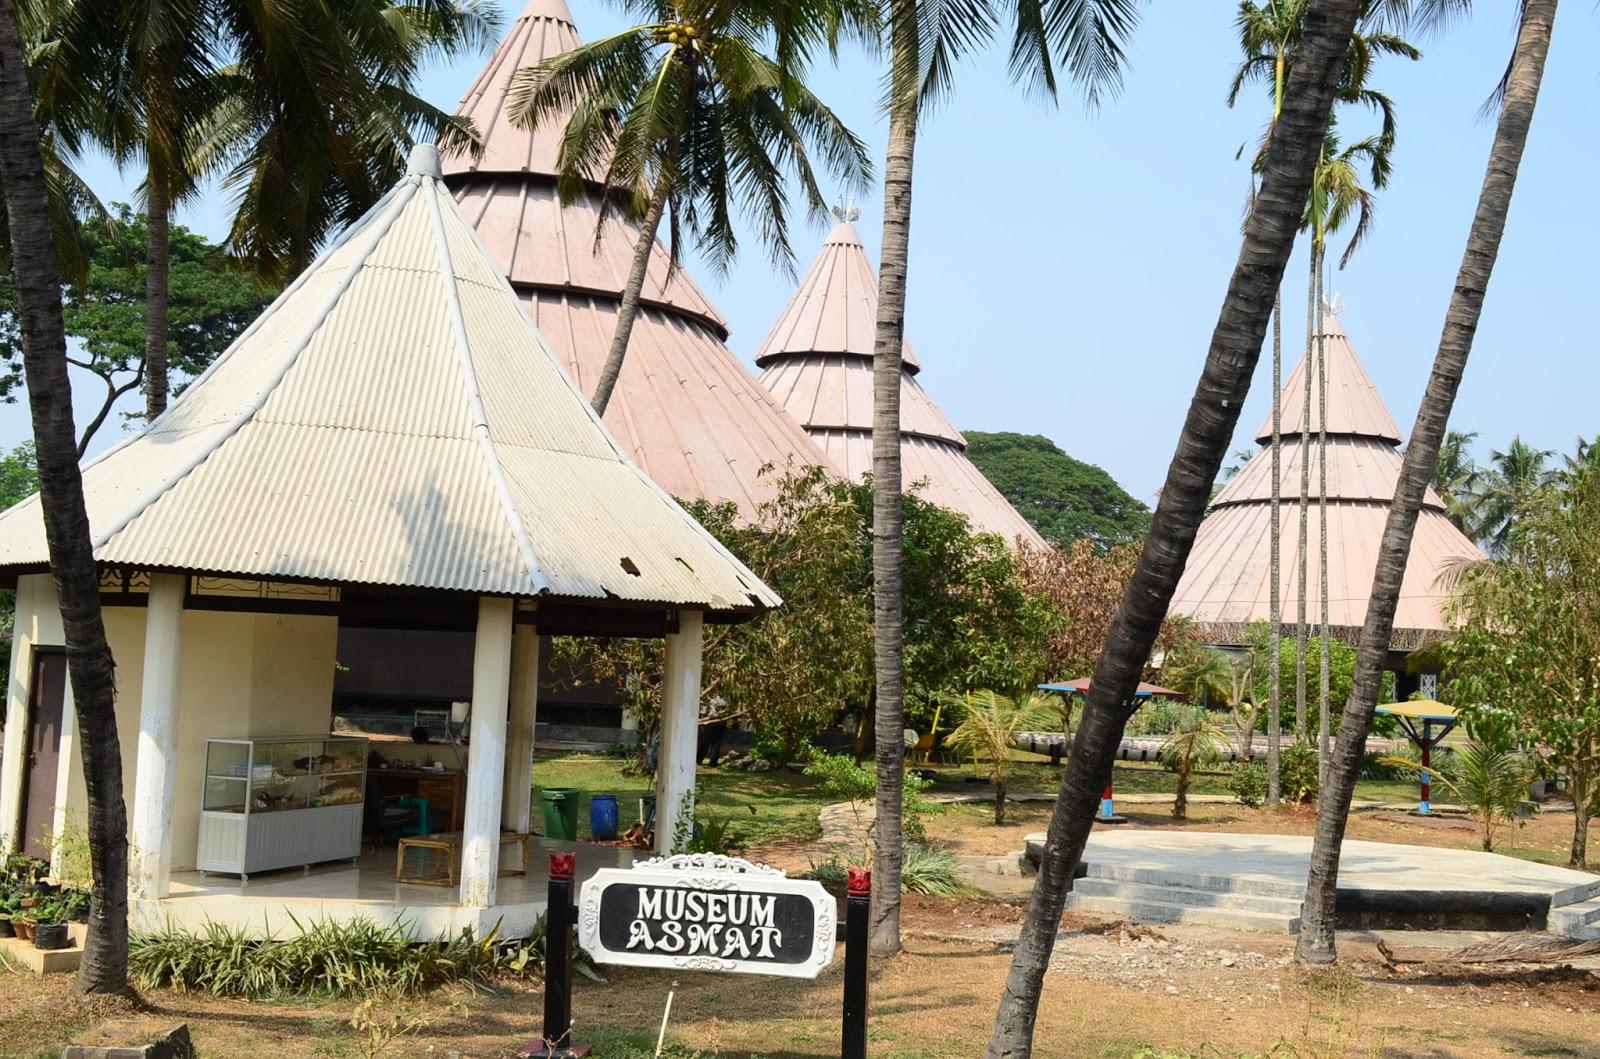 Visit Museums Indonesia List Tourism Asmat Museum Wangsit Mandala Siliwangi